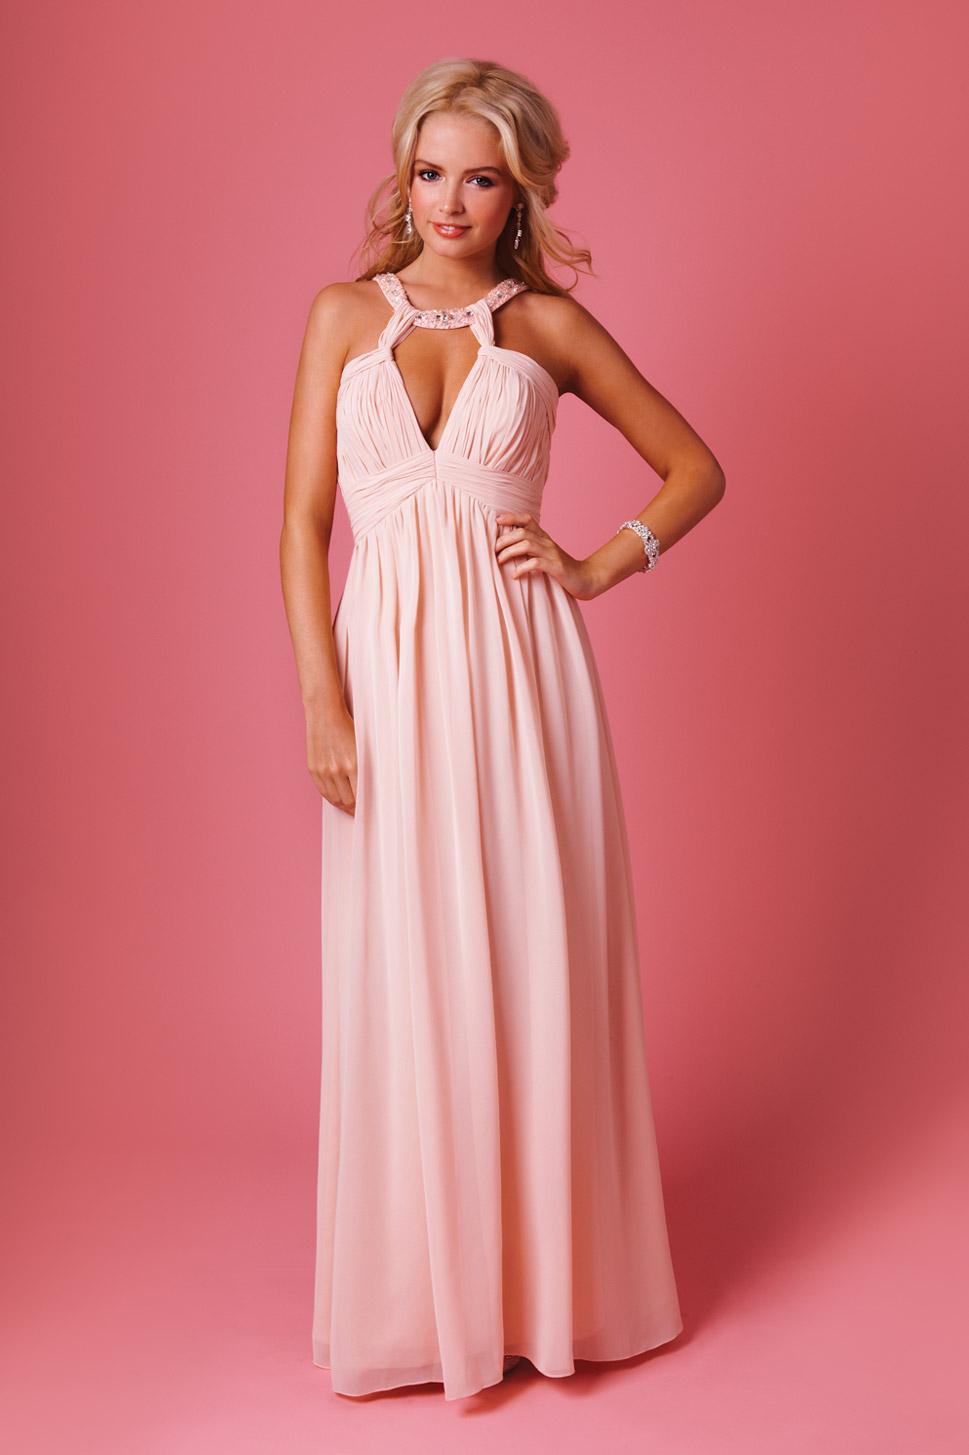 Honey Buy Amanda Wyatt 2012 Spring And Summer Prom Dresses